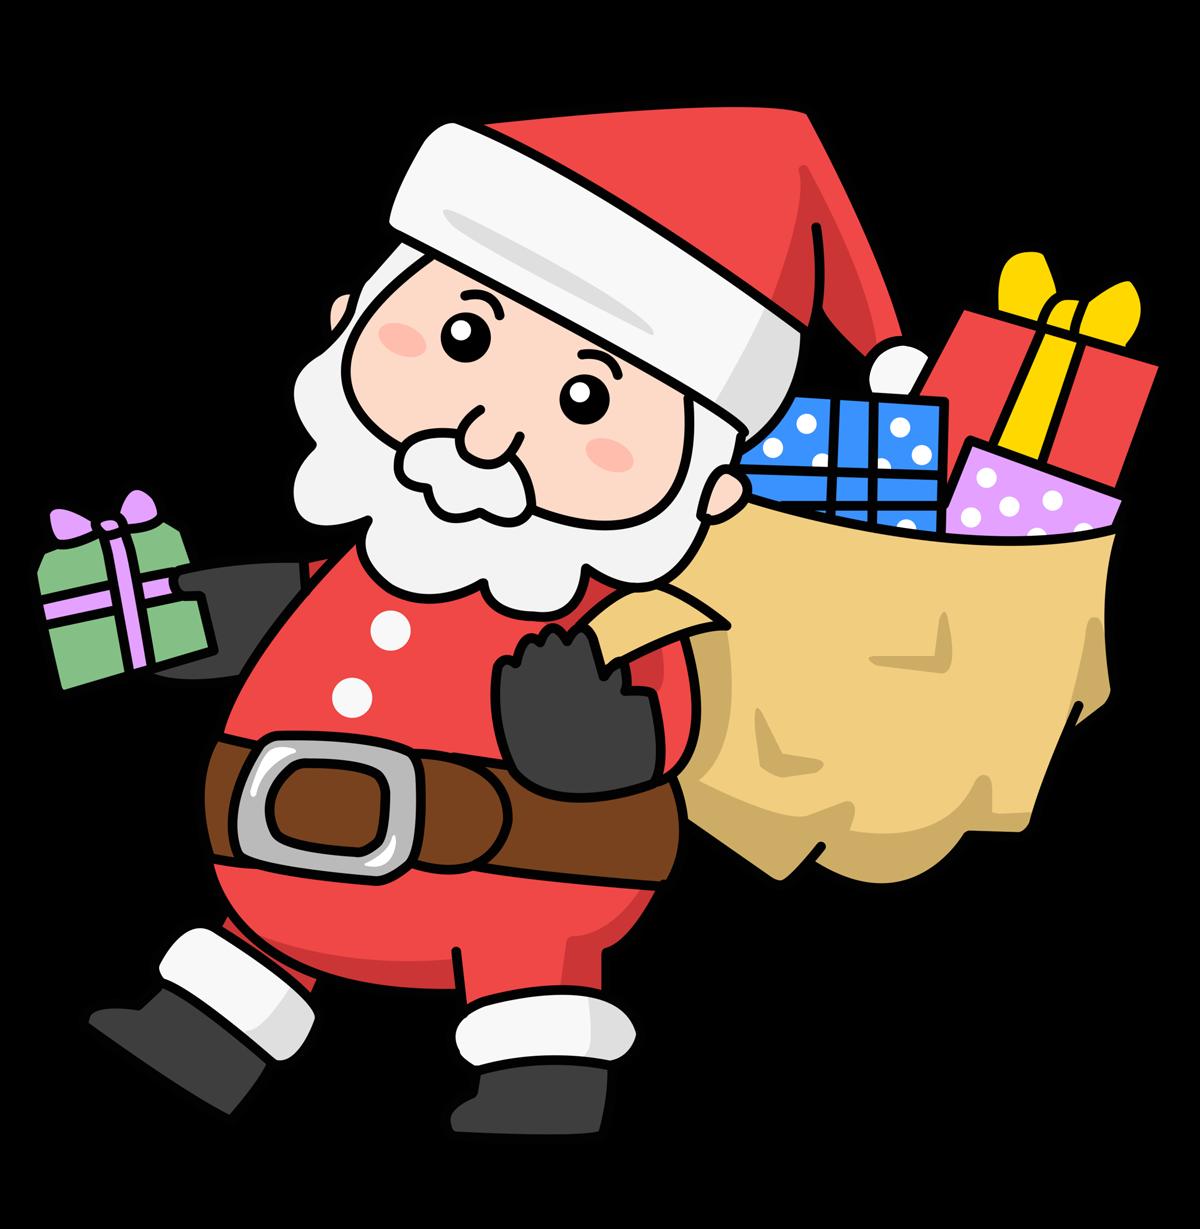 Santa Claus Clip Art Animated | Clipart Panda - Free Clipart Images